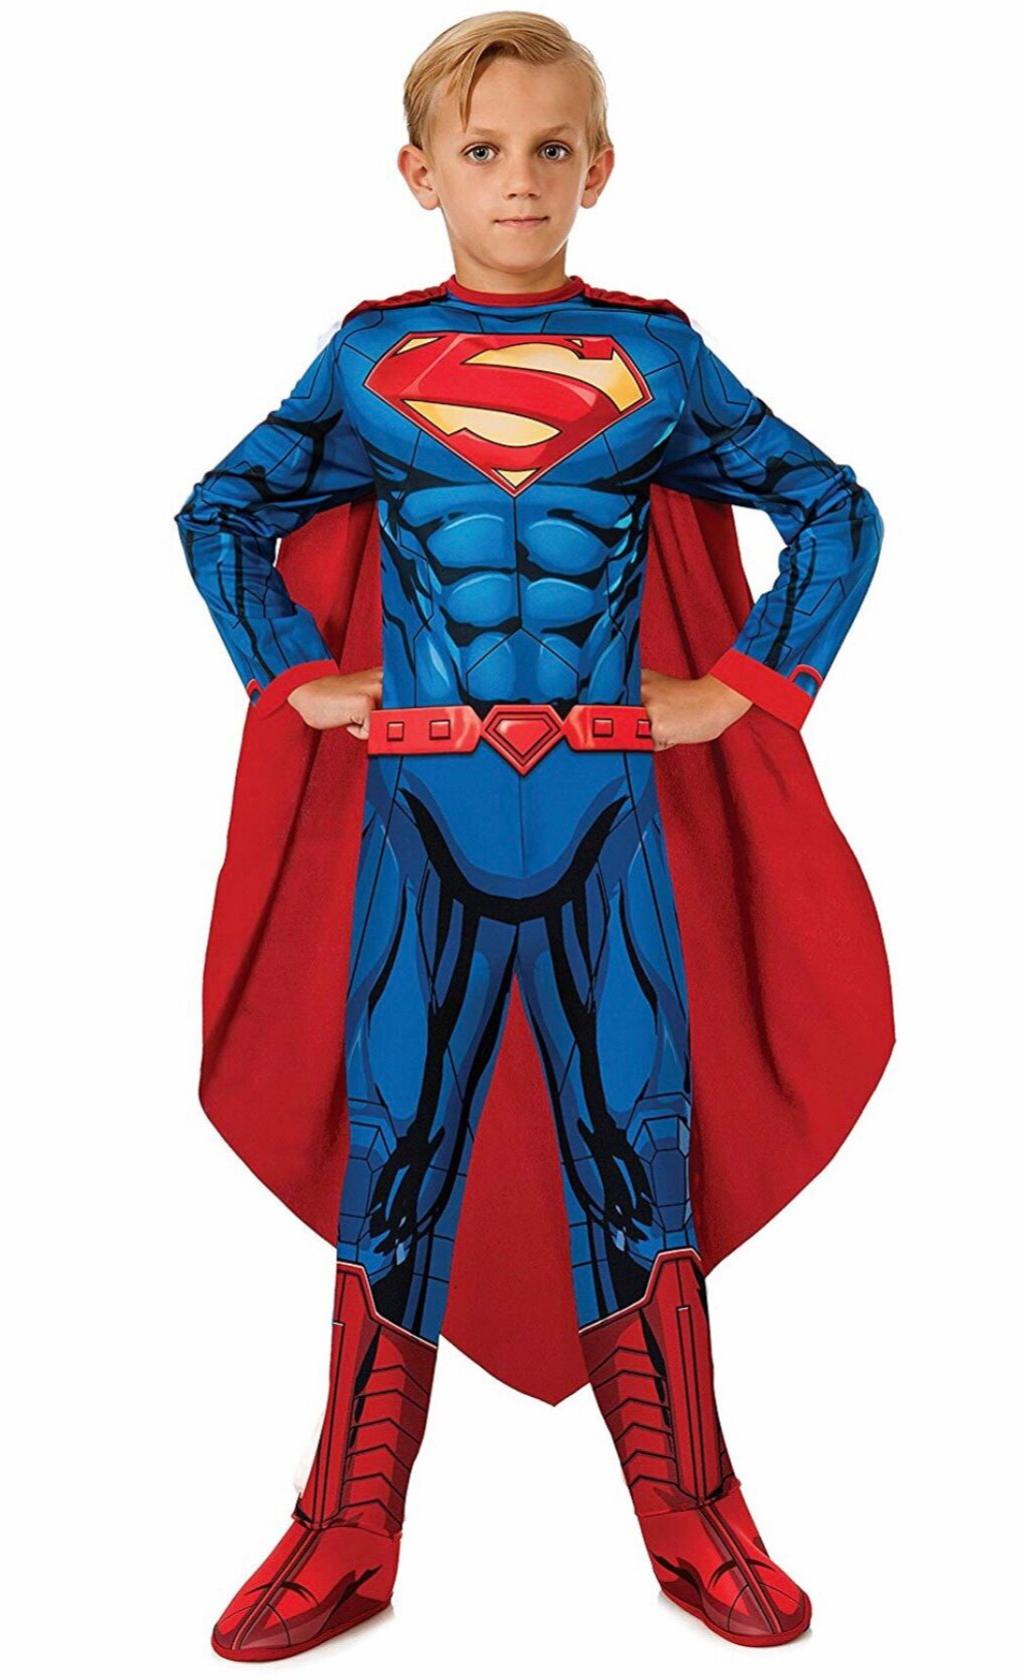 DC Universe Superman Costume